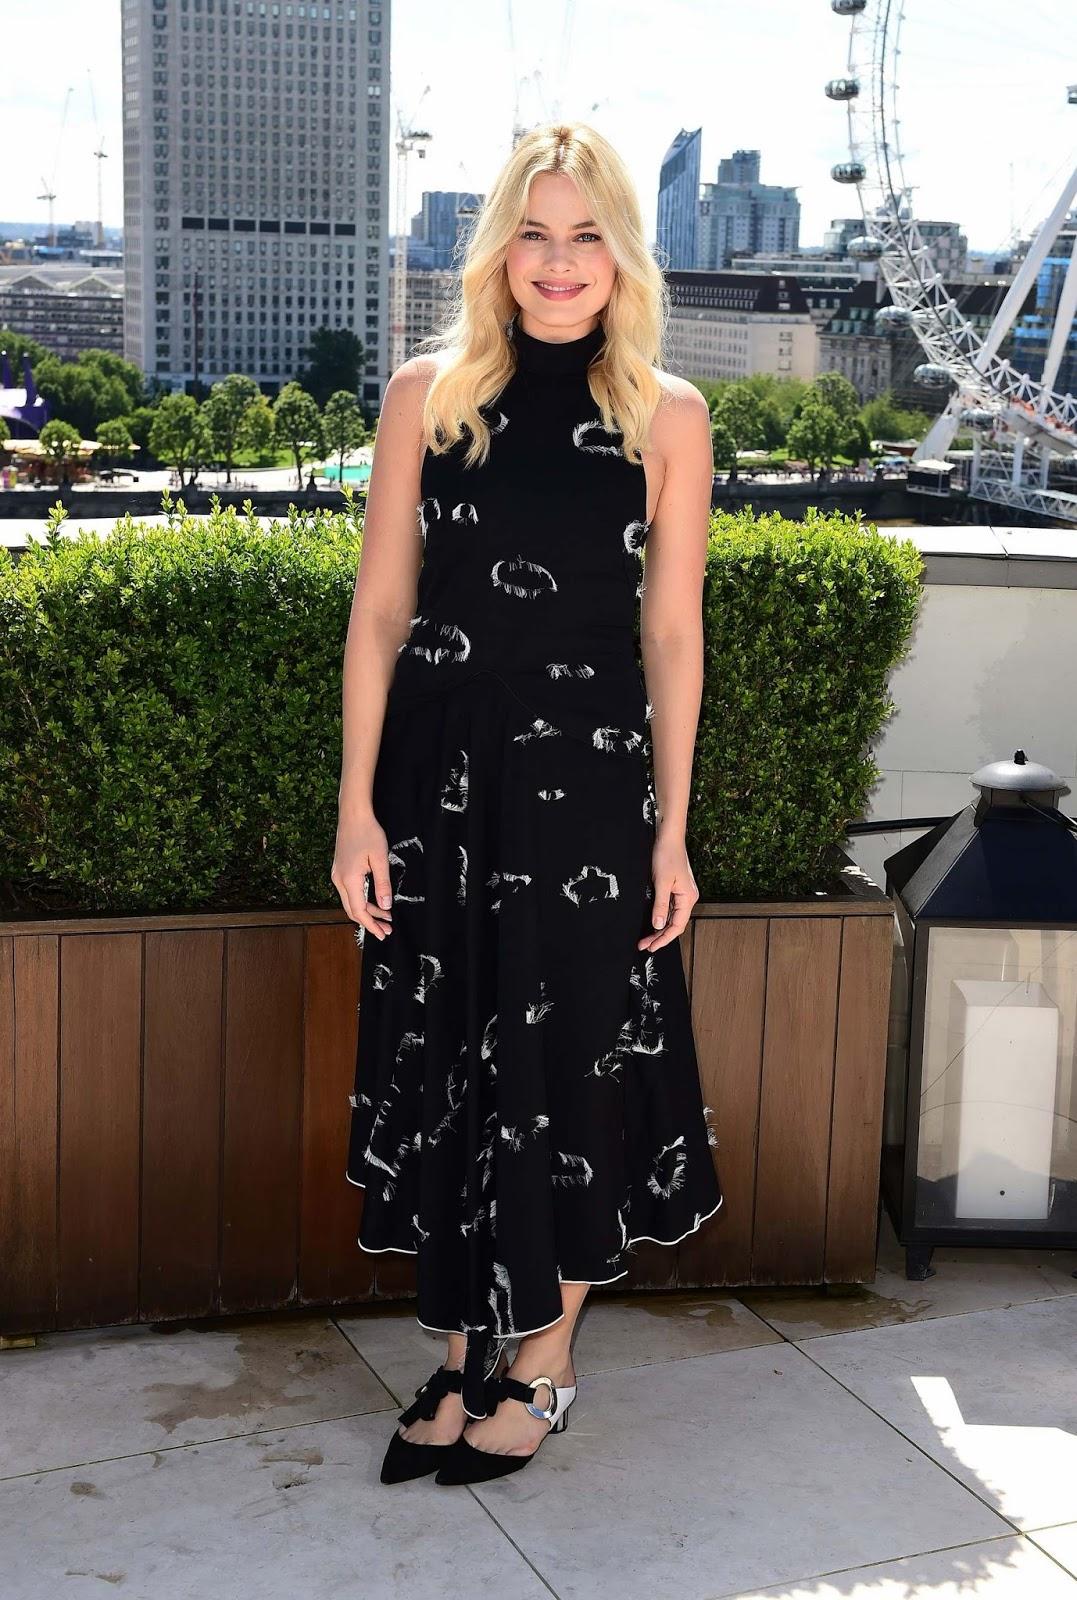 Margot Robbie promotes 'The Legend of Tarzan' in London